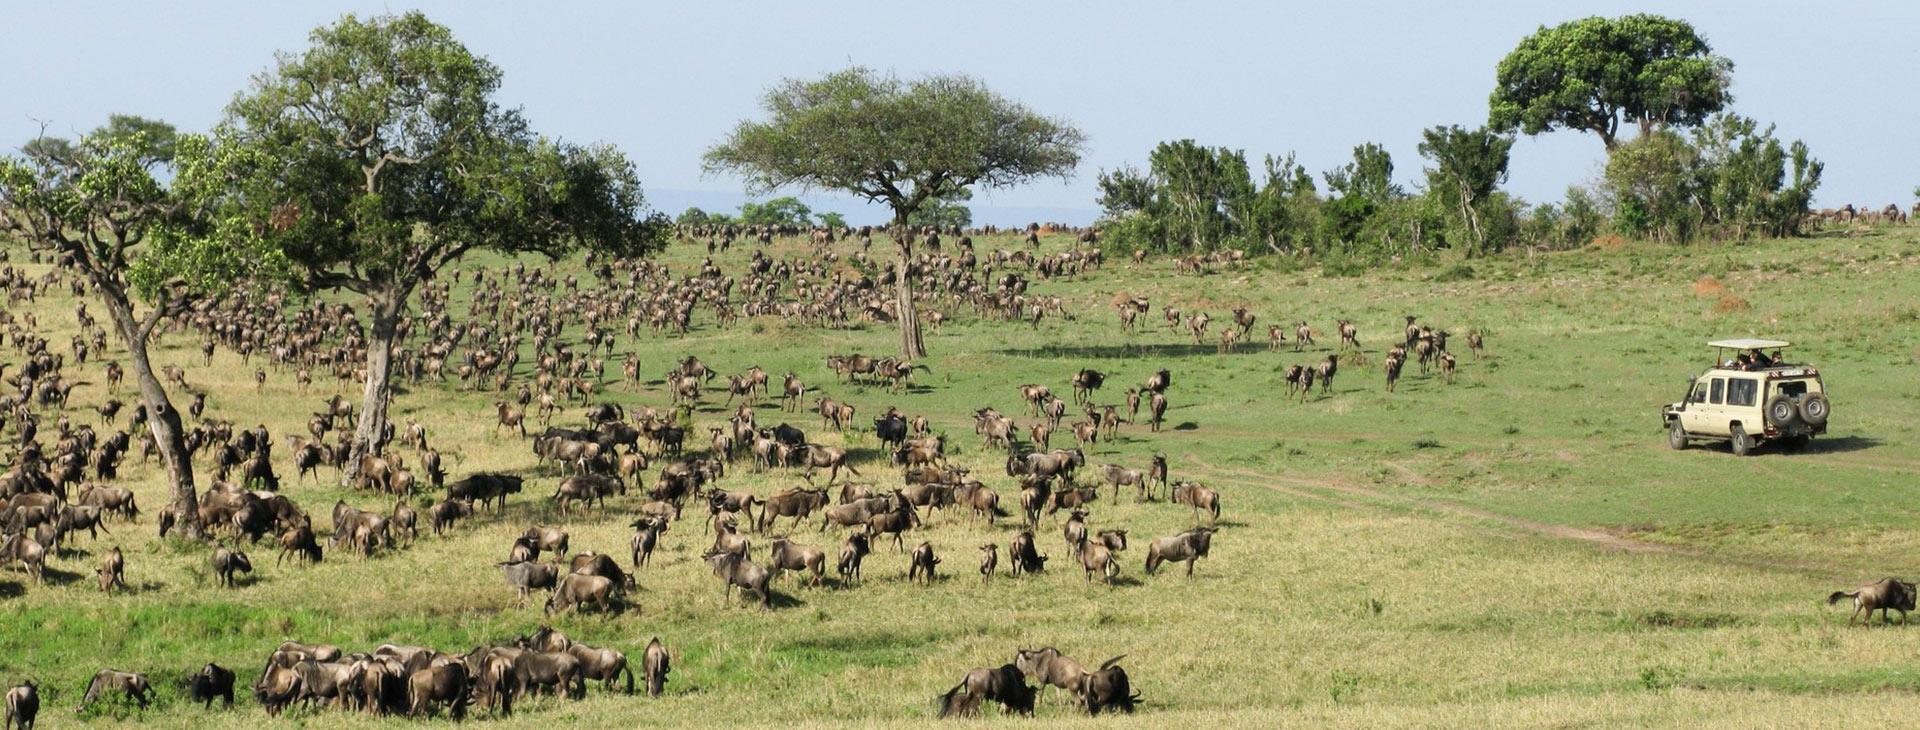 African Halal Camping Safari